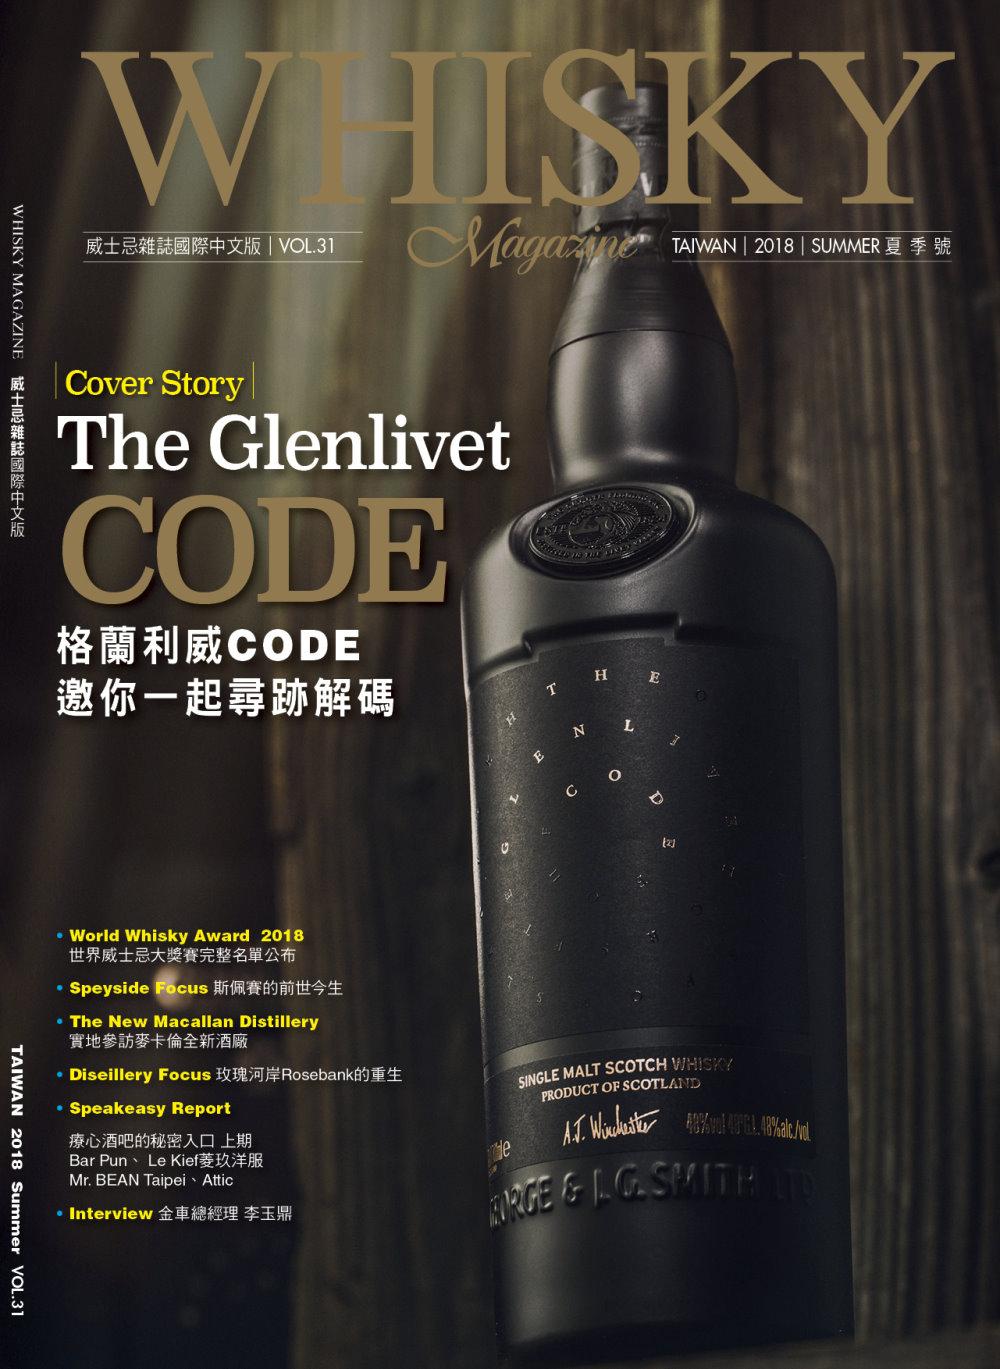 Whisky Magazine威士忌雜誌國際中文版 夏季號/2018第31期